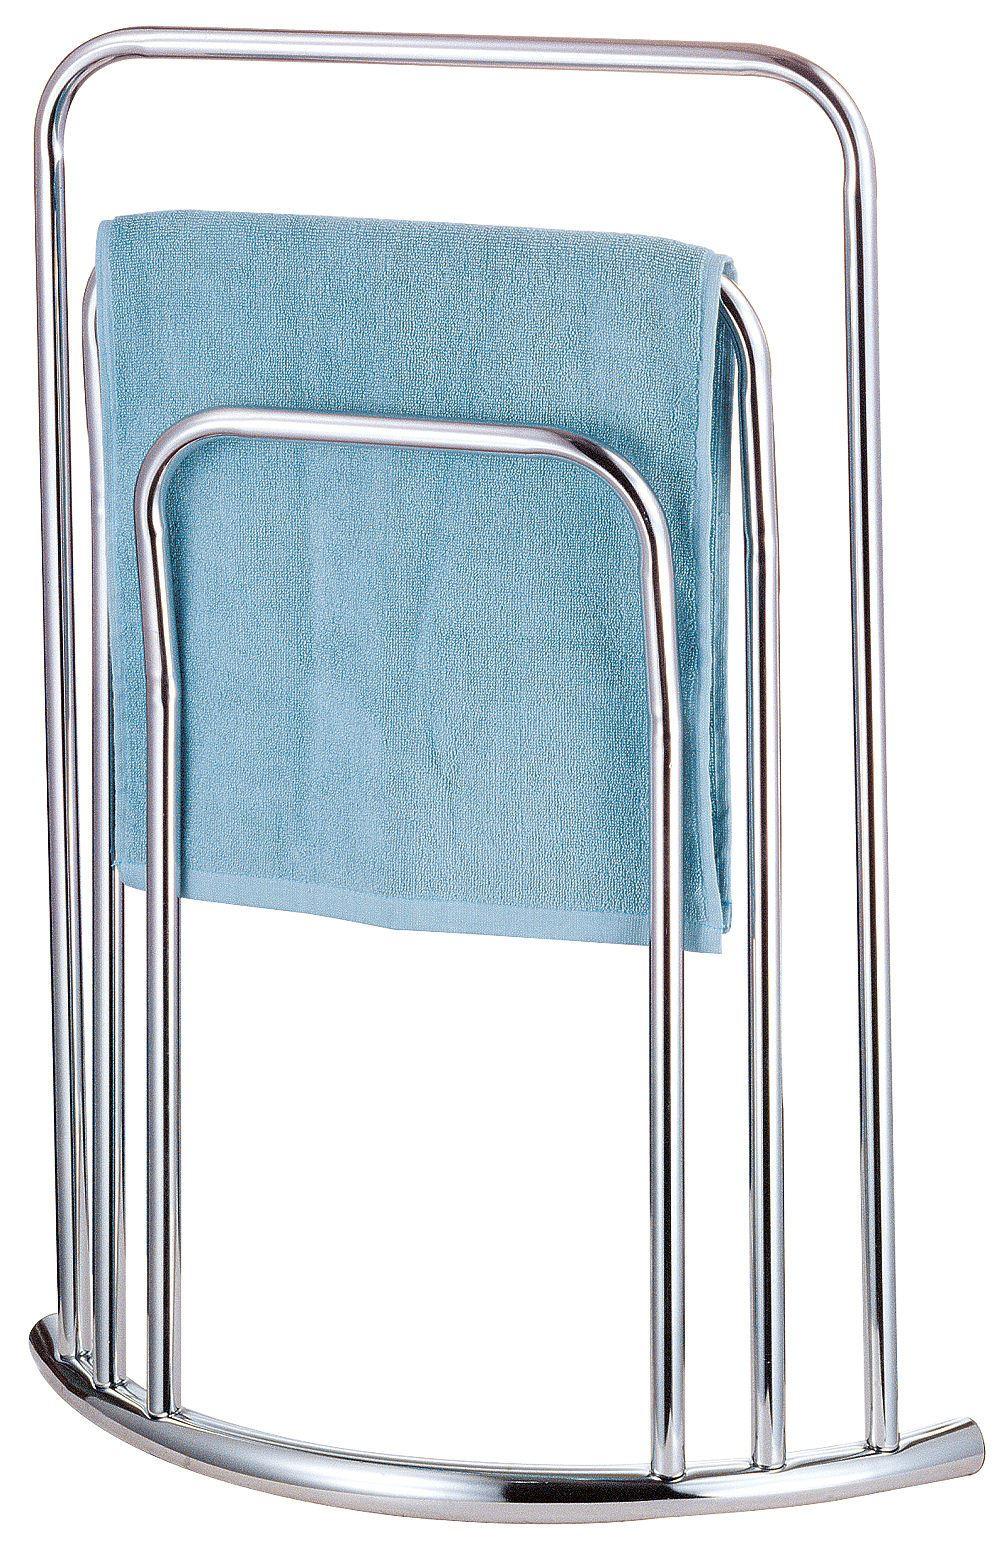 MODERN CHROME QUALITY BATHROOM SHELF TOWEL STAND RACK RAILS | eBay